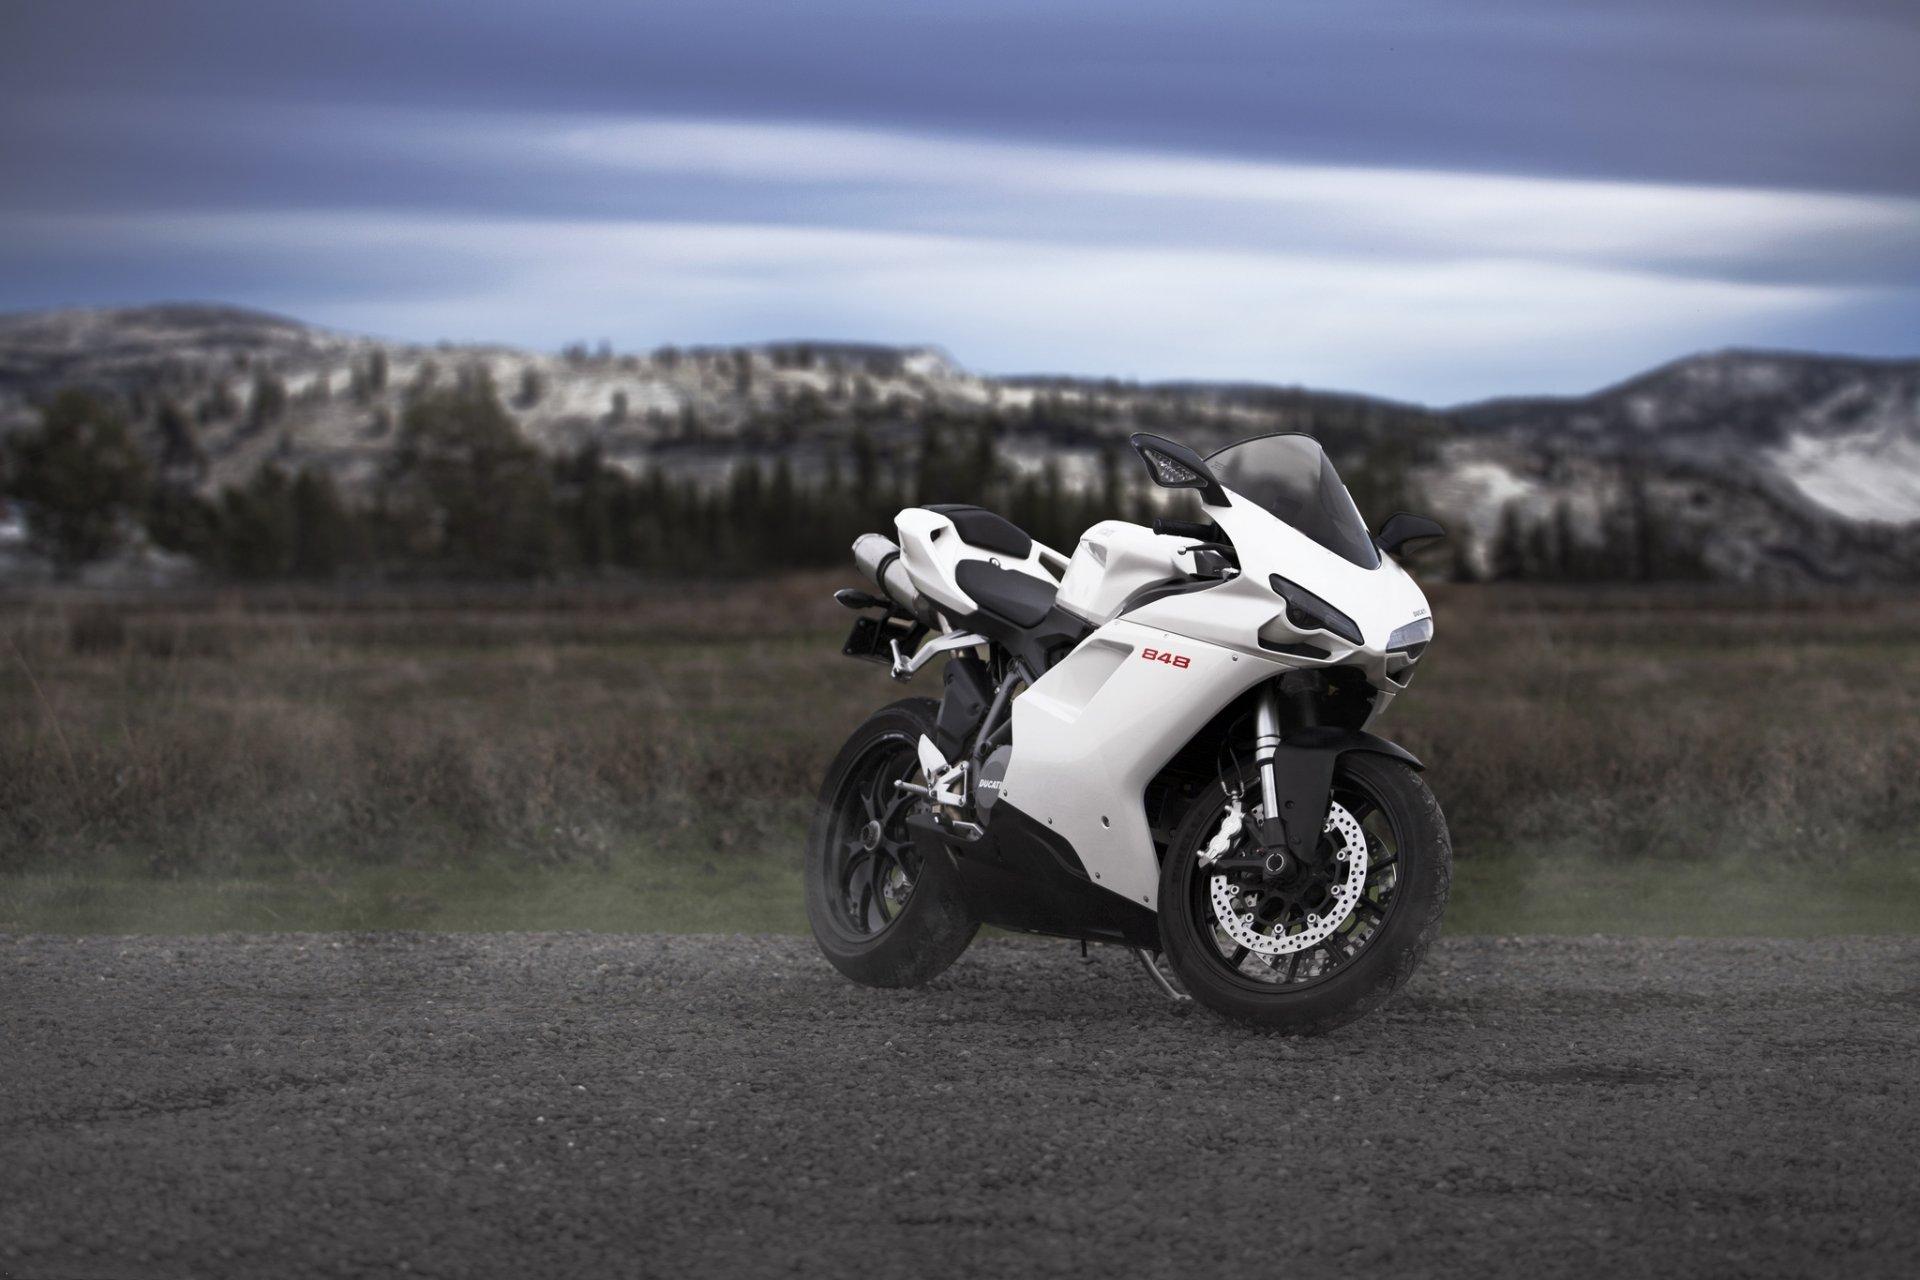 мотоцикл дукати белый загрузить